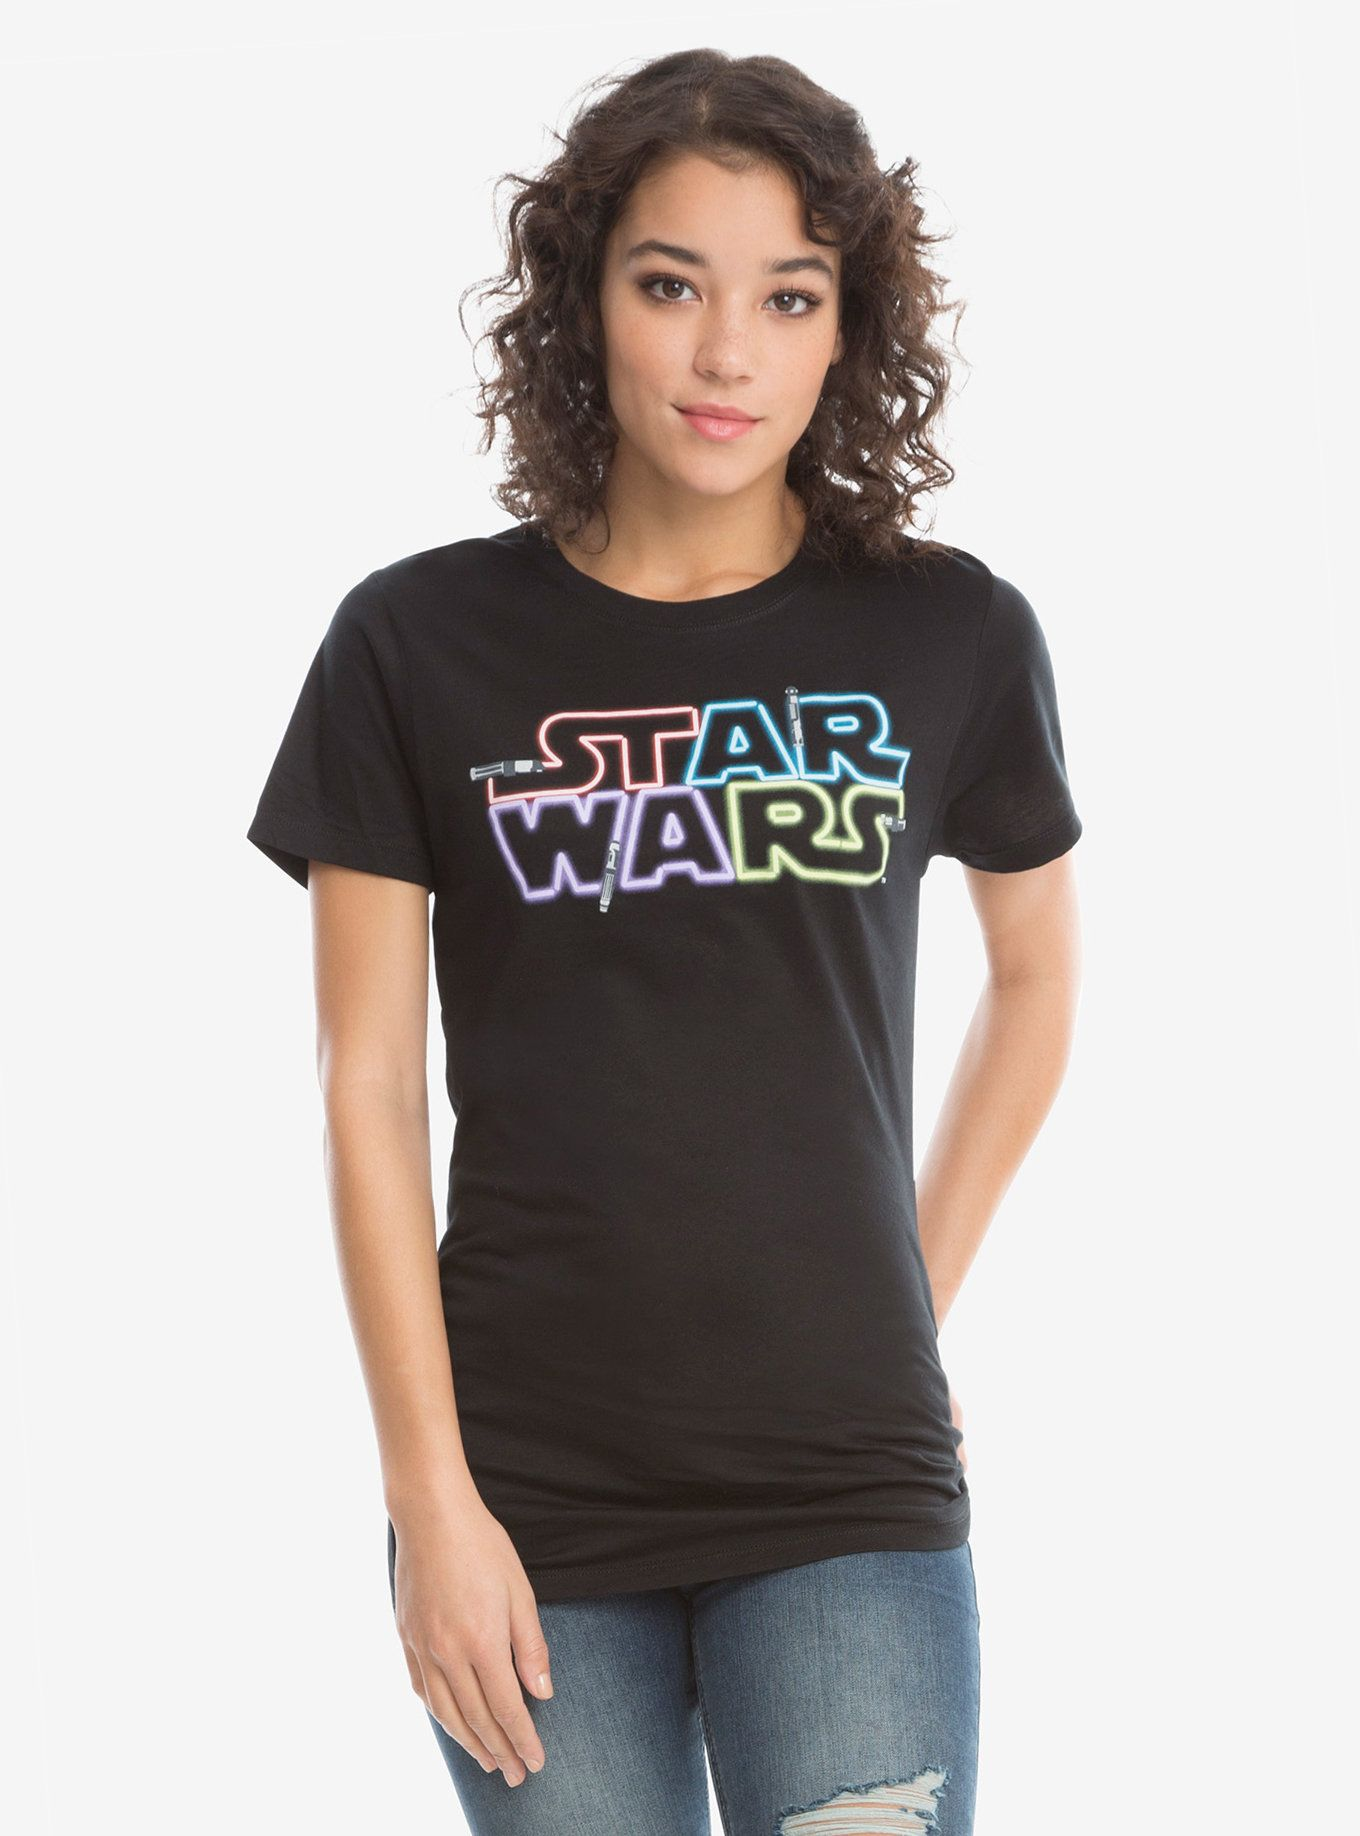 Childrens Star Wars Written Logo Tshirt Boys Girls Kids The Last Jedi T Shirt